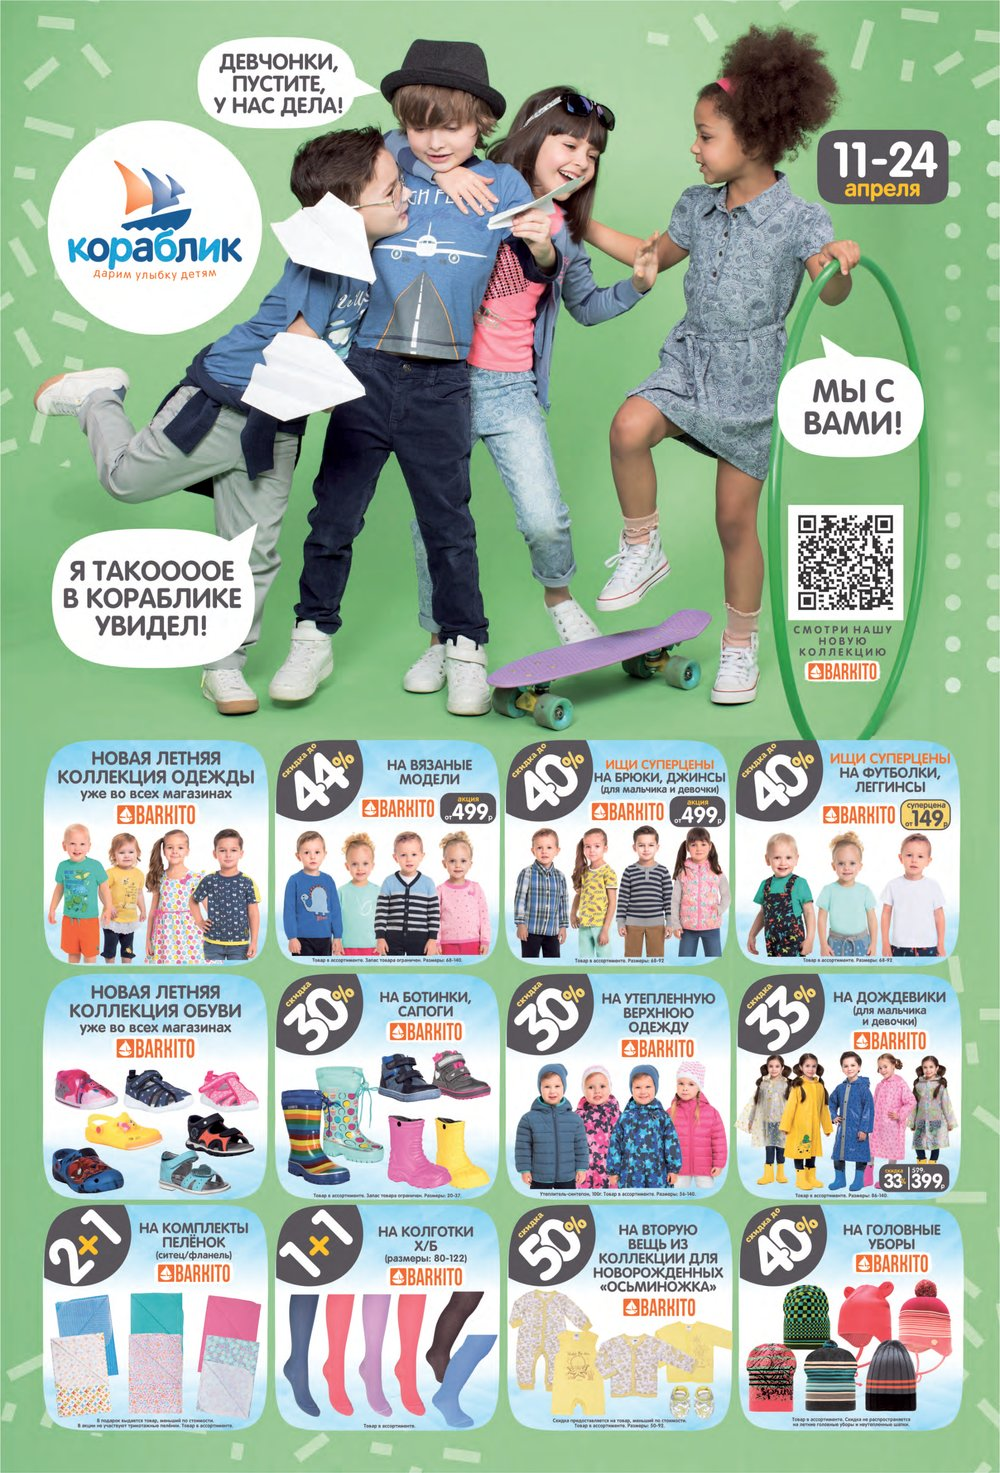 Каталог акций Кораблик с 11 по 24 апреля 2018 - стр. 1